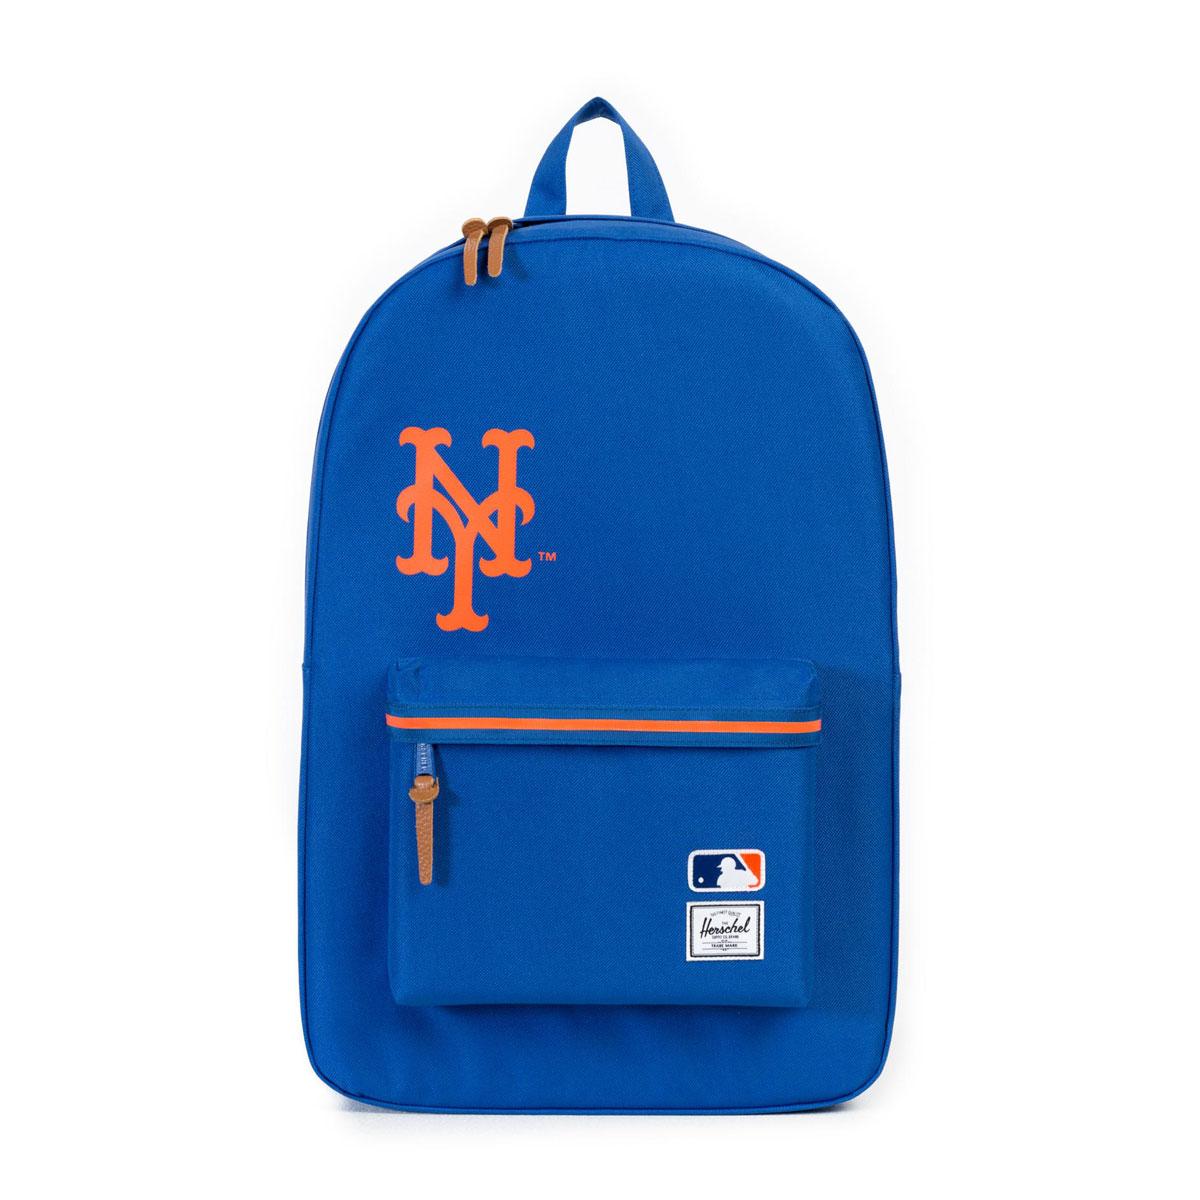 Herschel Supply Co HERITAGE BACKPACK(ハーシェル サプライ ヘリテージ バックパック)New York Mets【メンズ レディース バックパック】18SP-I